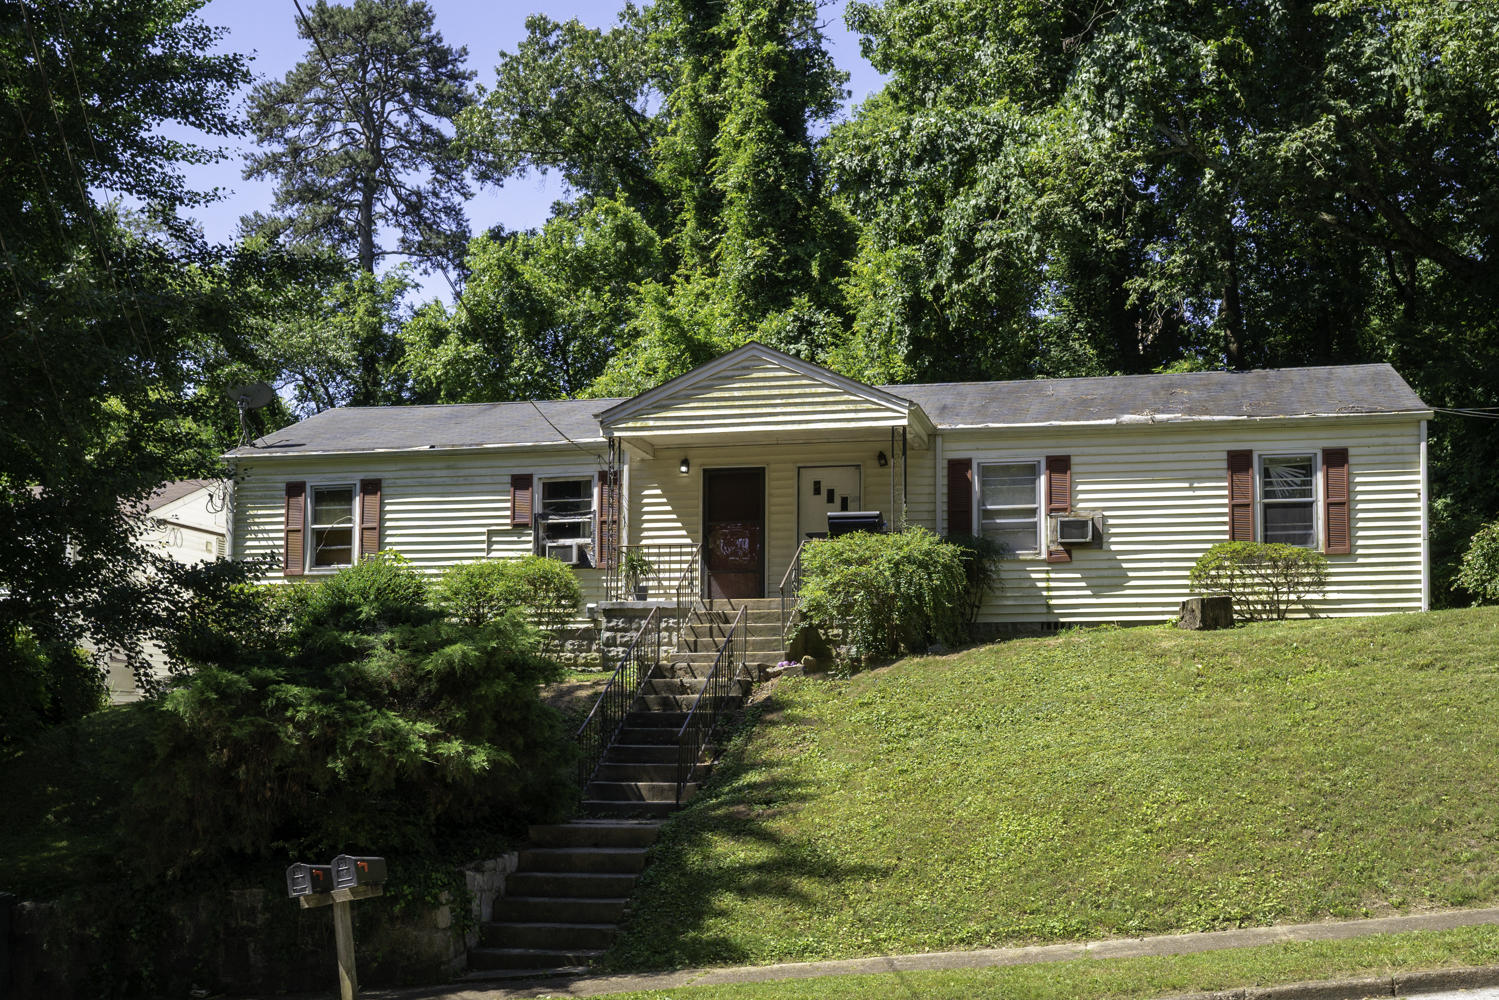 1300&1304 Dugdale St, Chattanooga, TN 37405